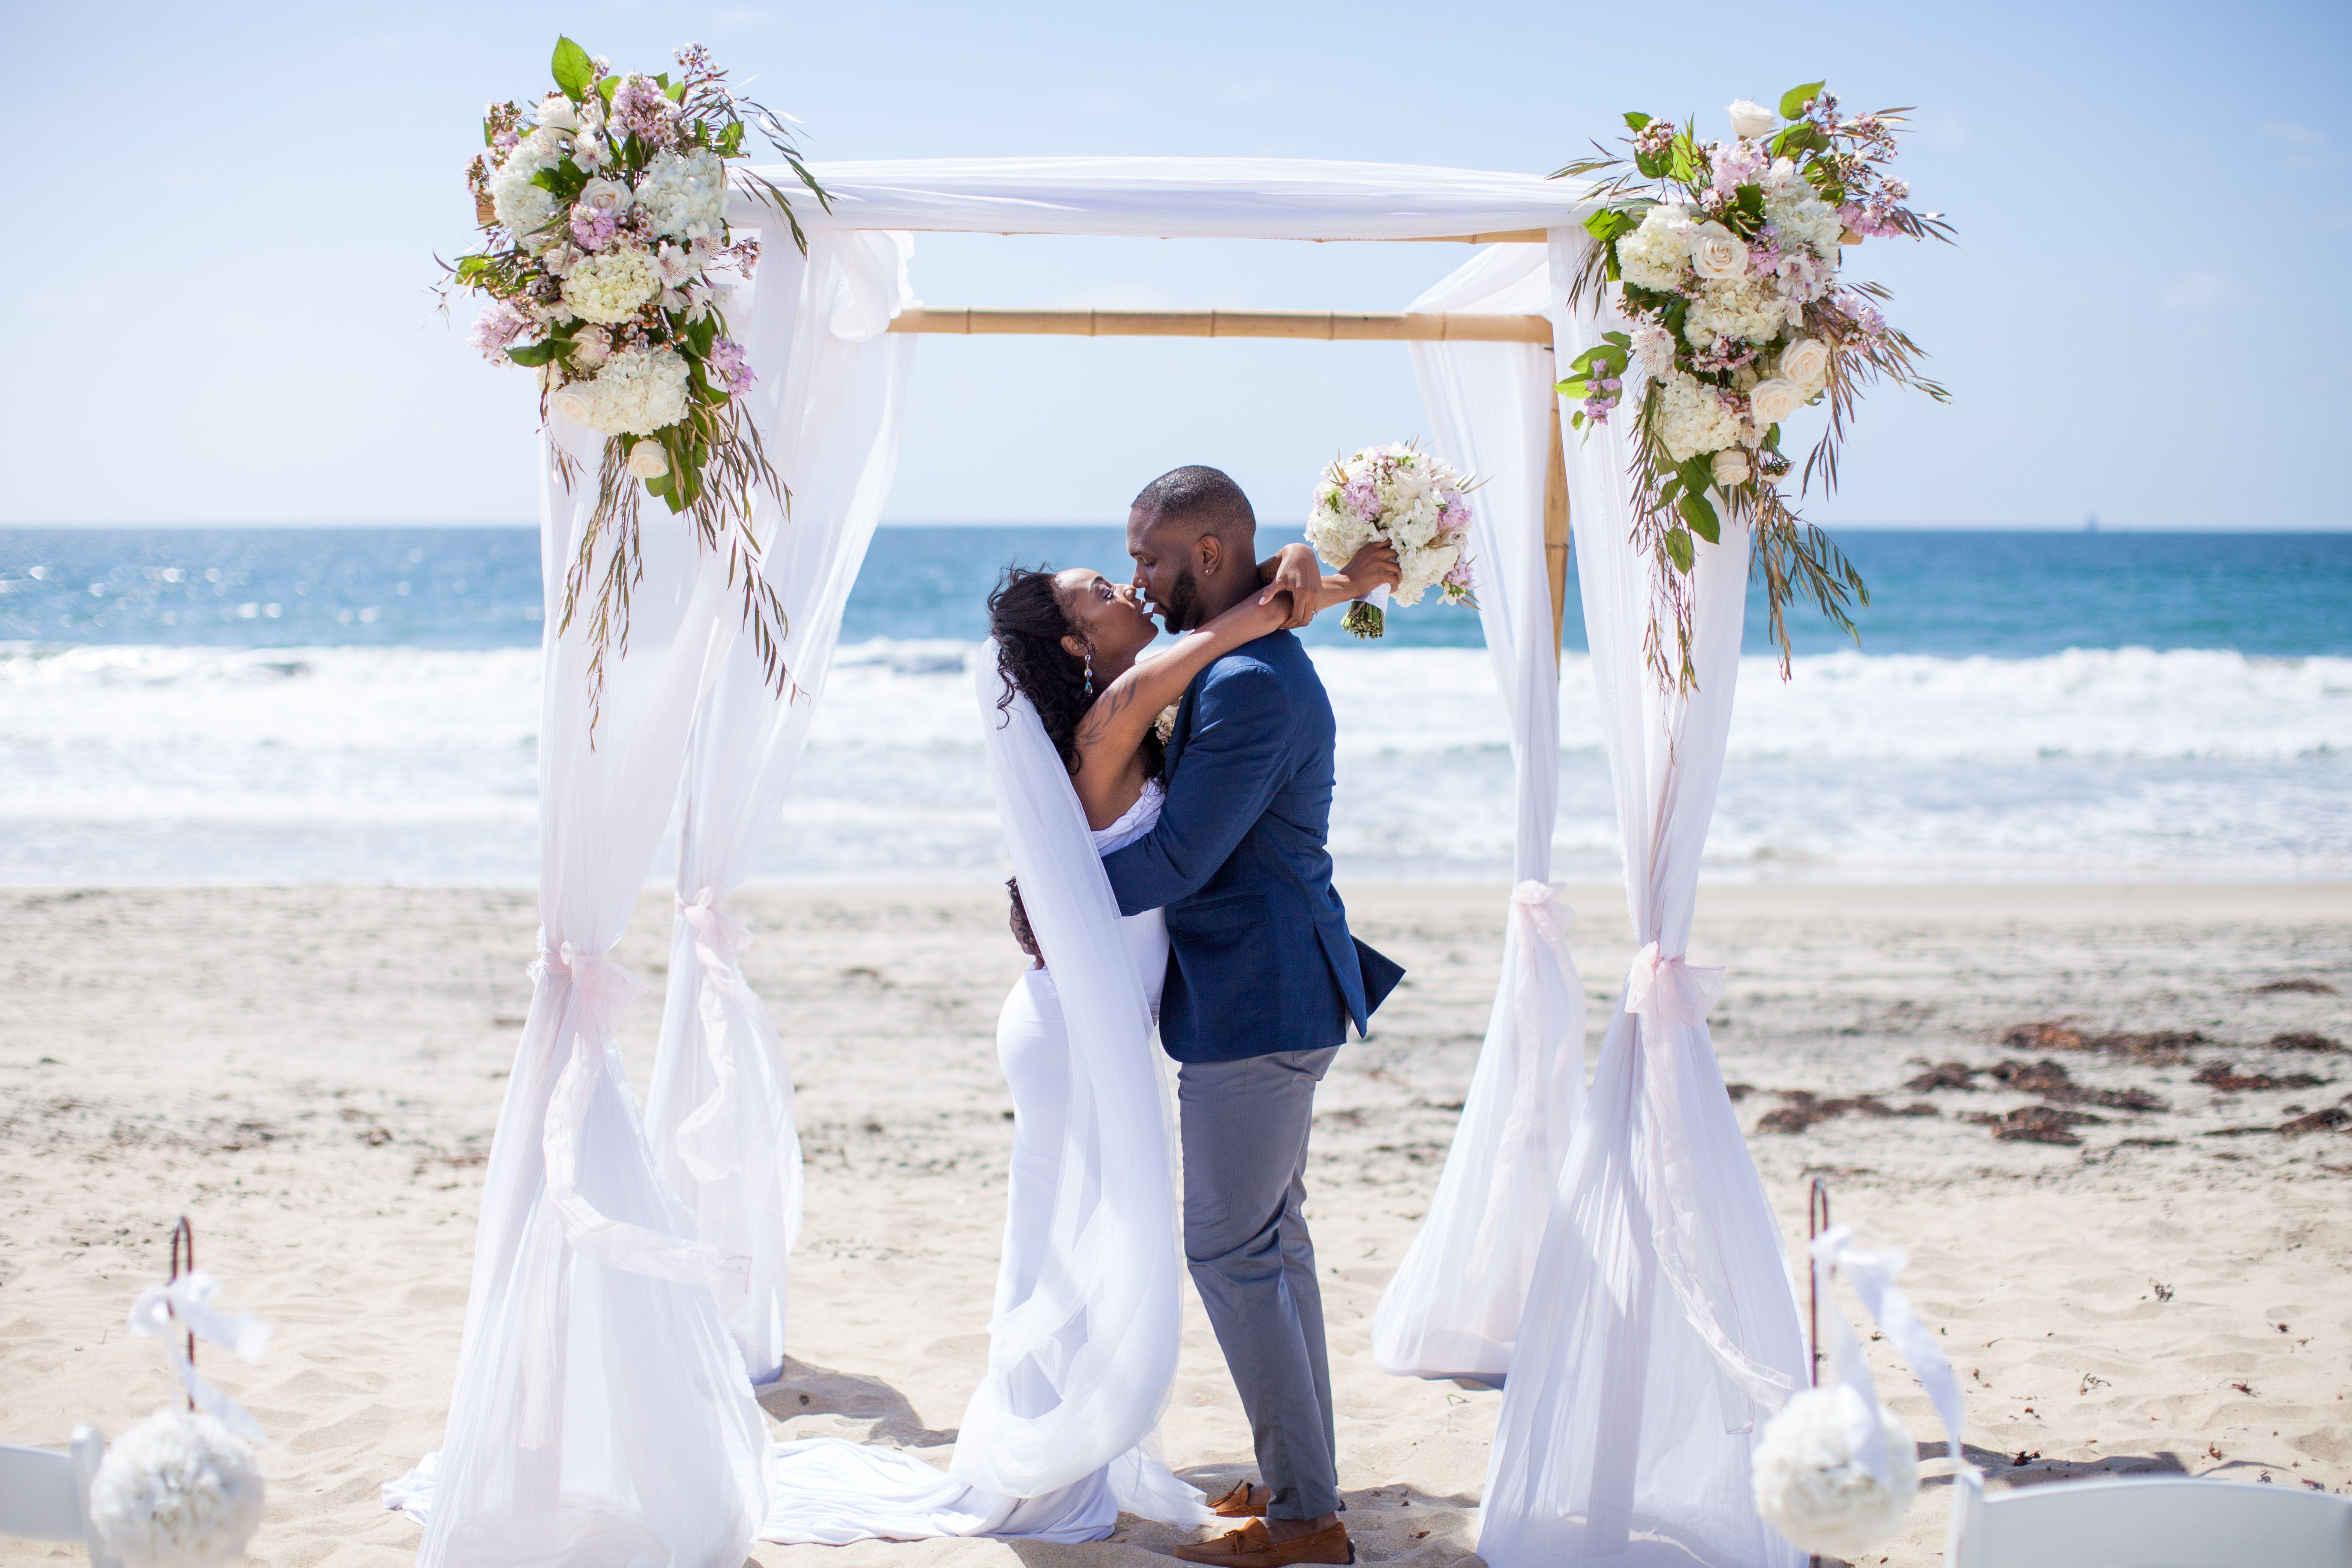 Pin By Dream Beach Wedding San Dieg On Canopies By Dream Beach Wedding San Diego With Images Dream Beach Wedding San Diego Wedding Venues San Diego Beach Wedding